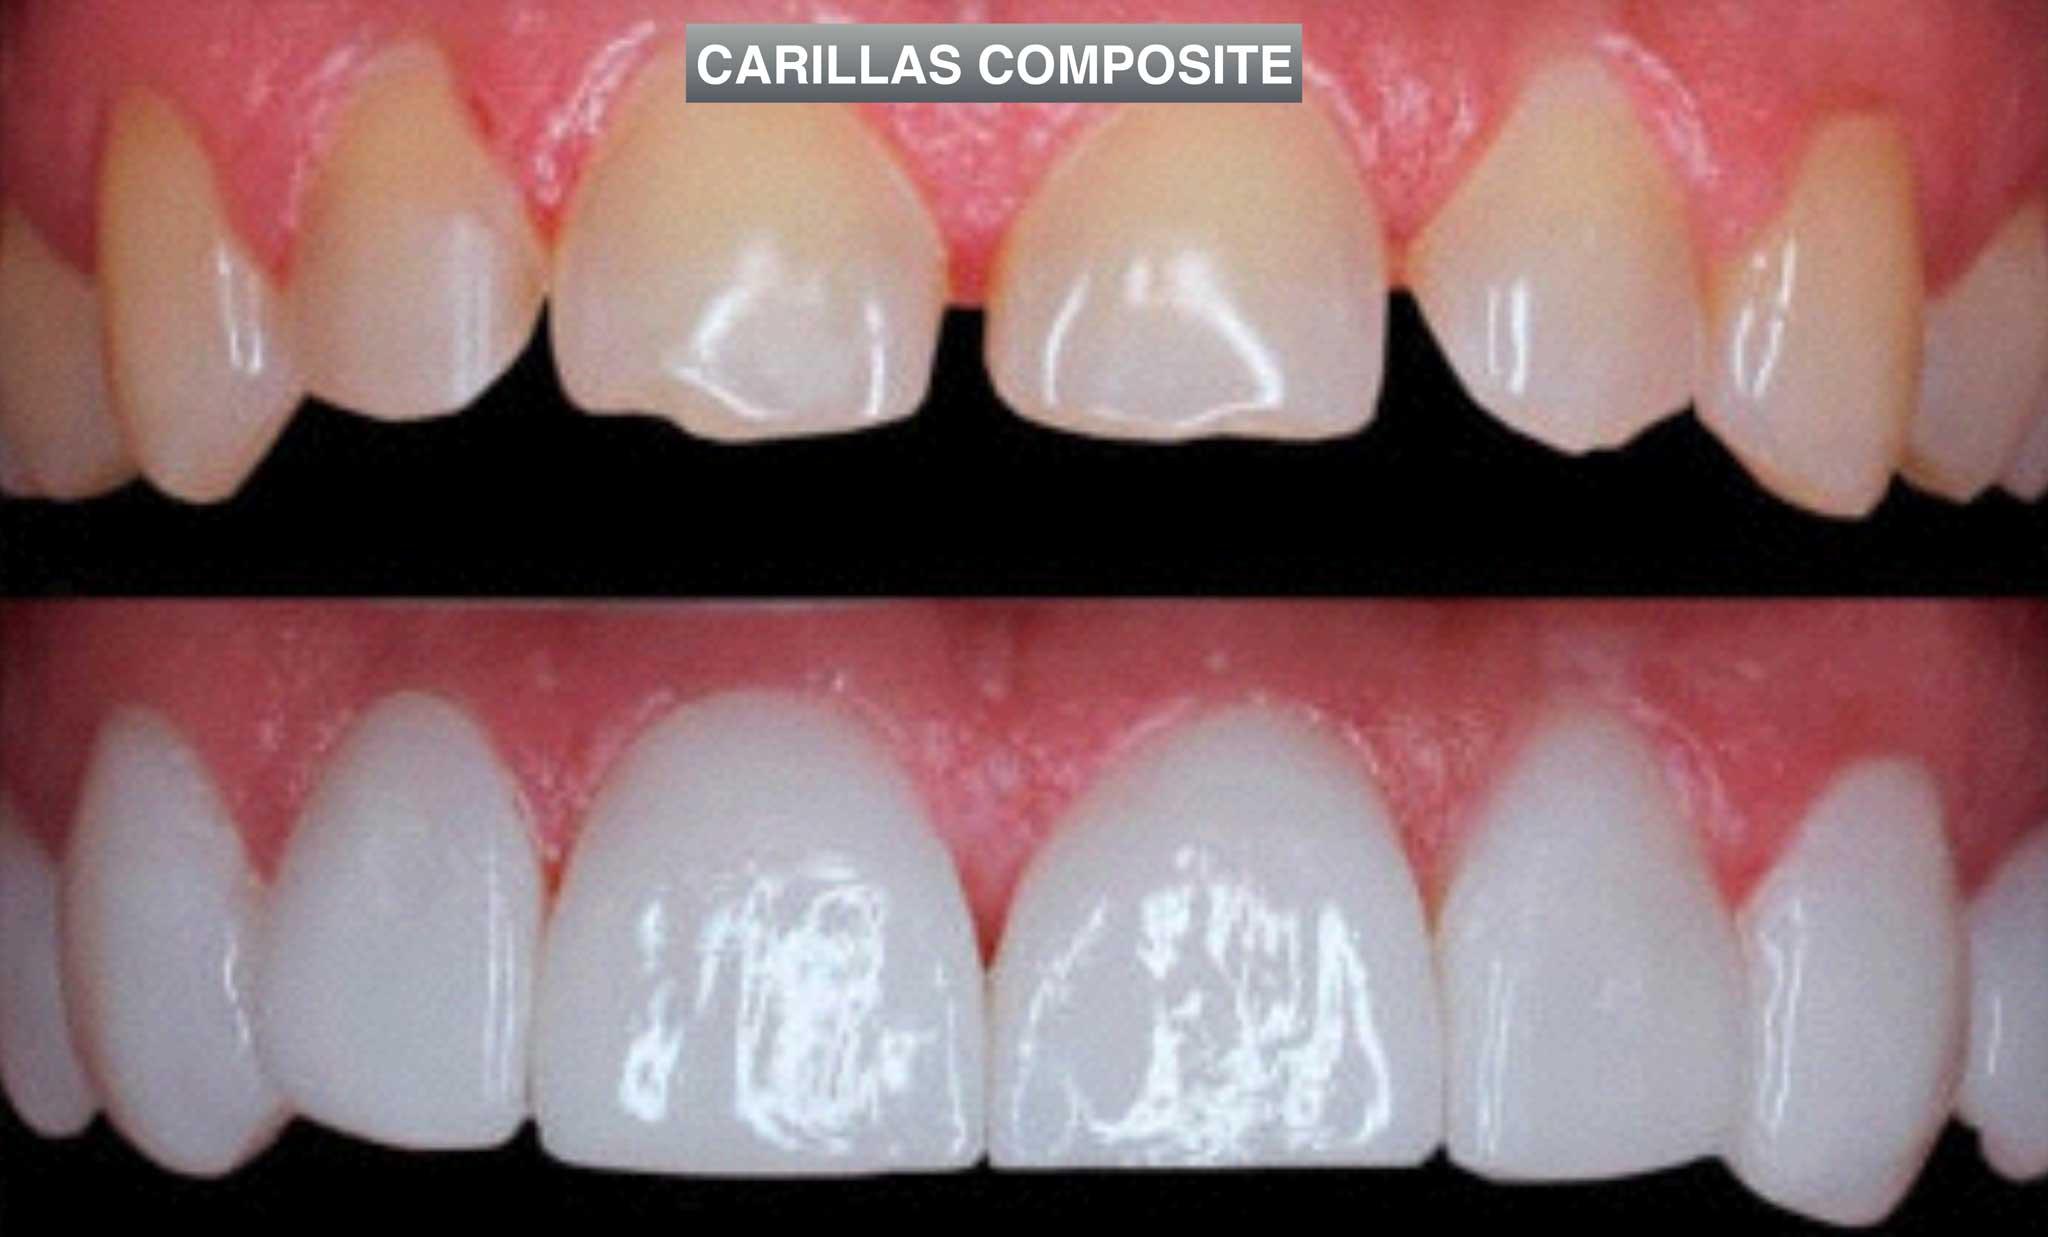 Carillas Composite – Clinica Dental Puchol